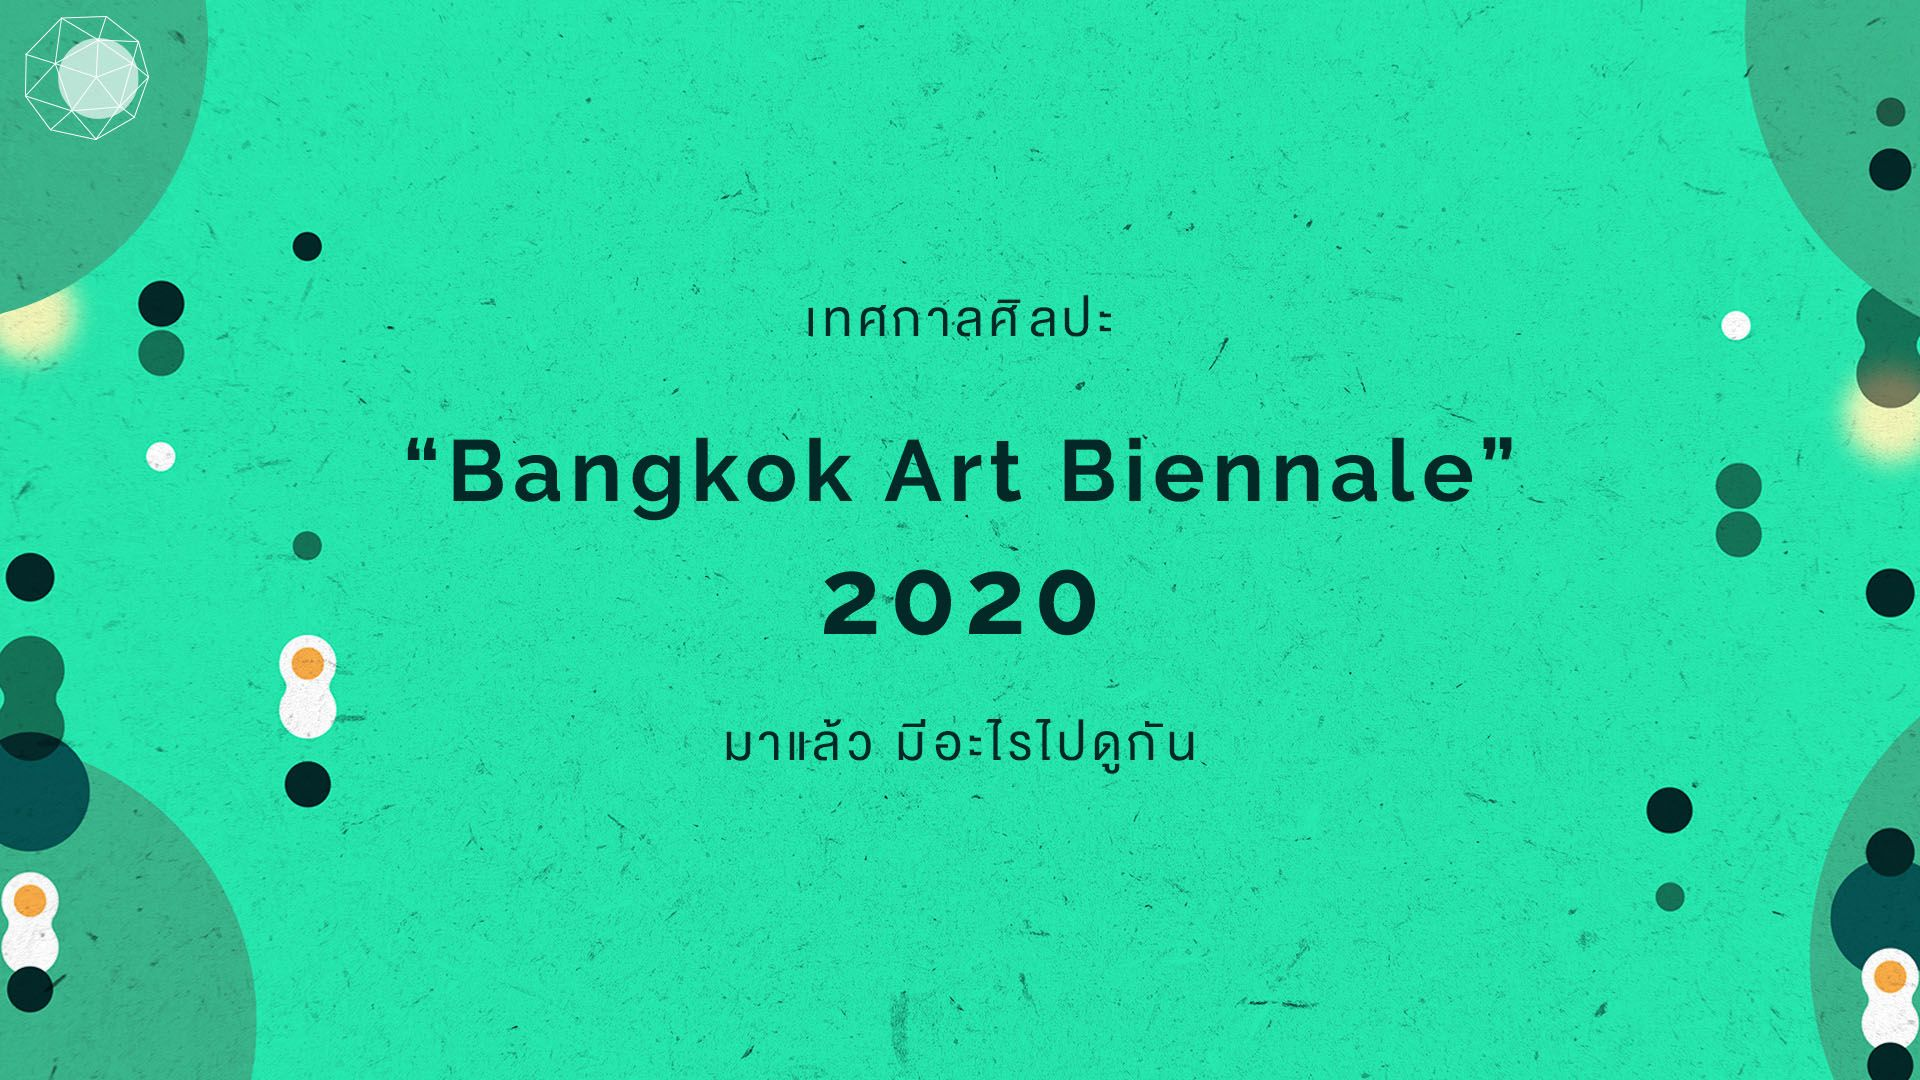 Bangkok Art Biennale 2020